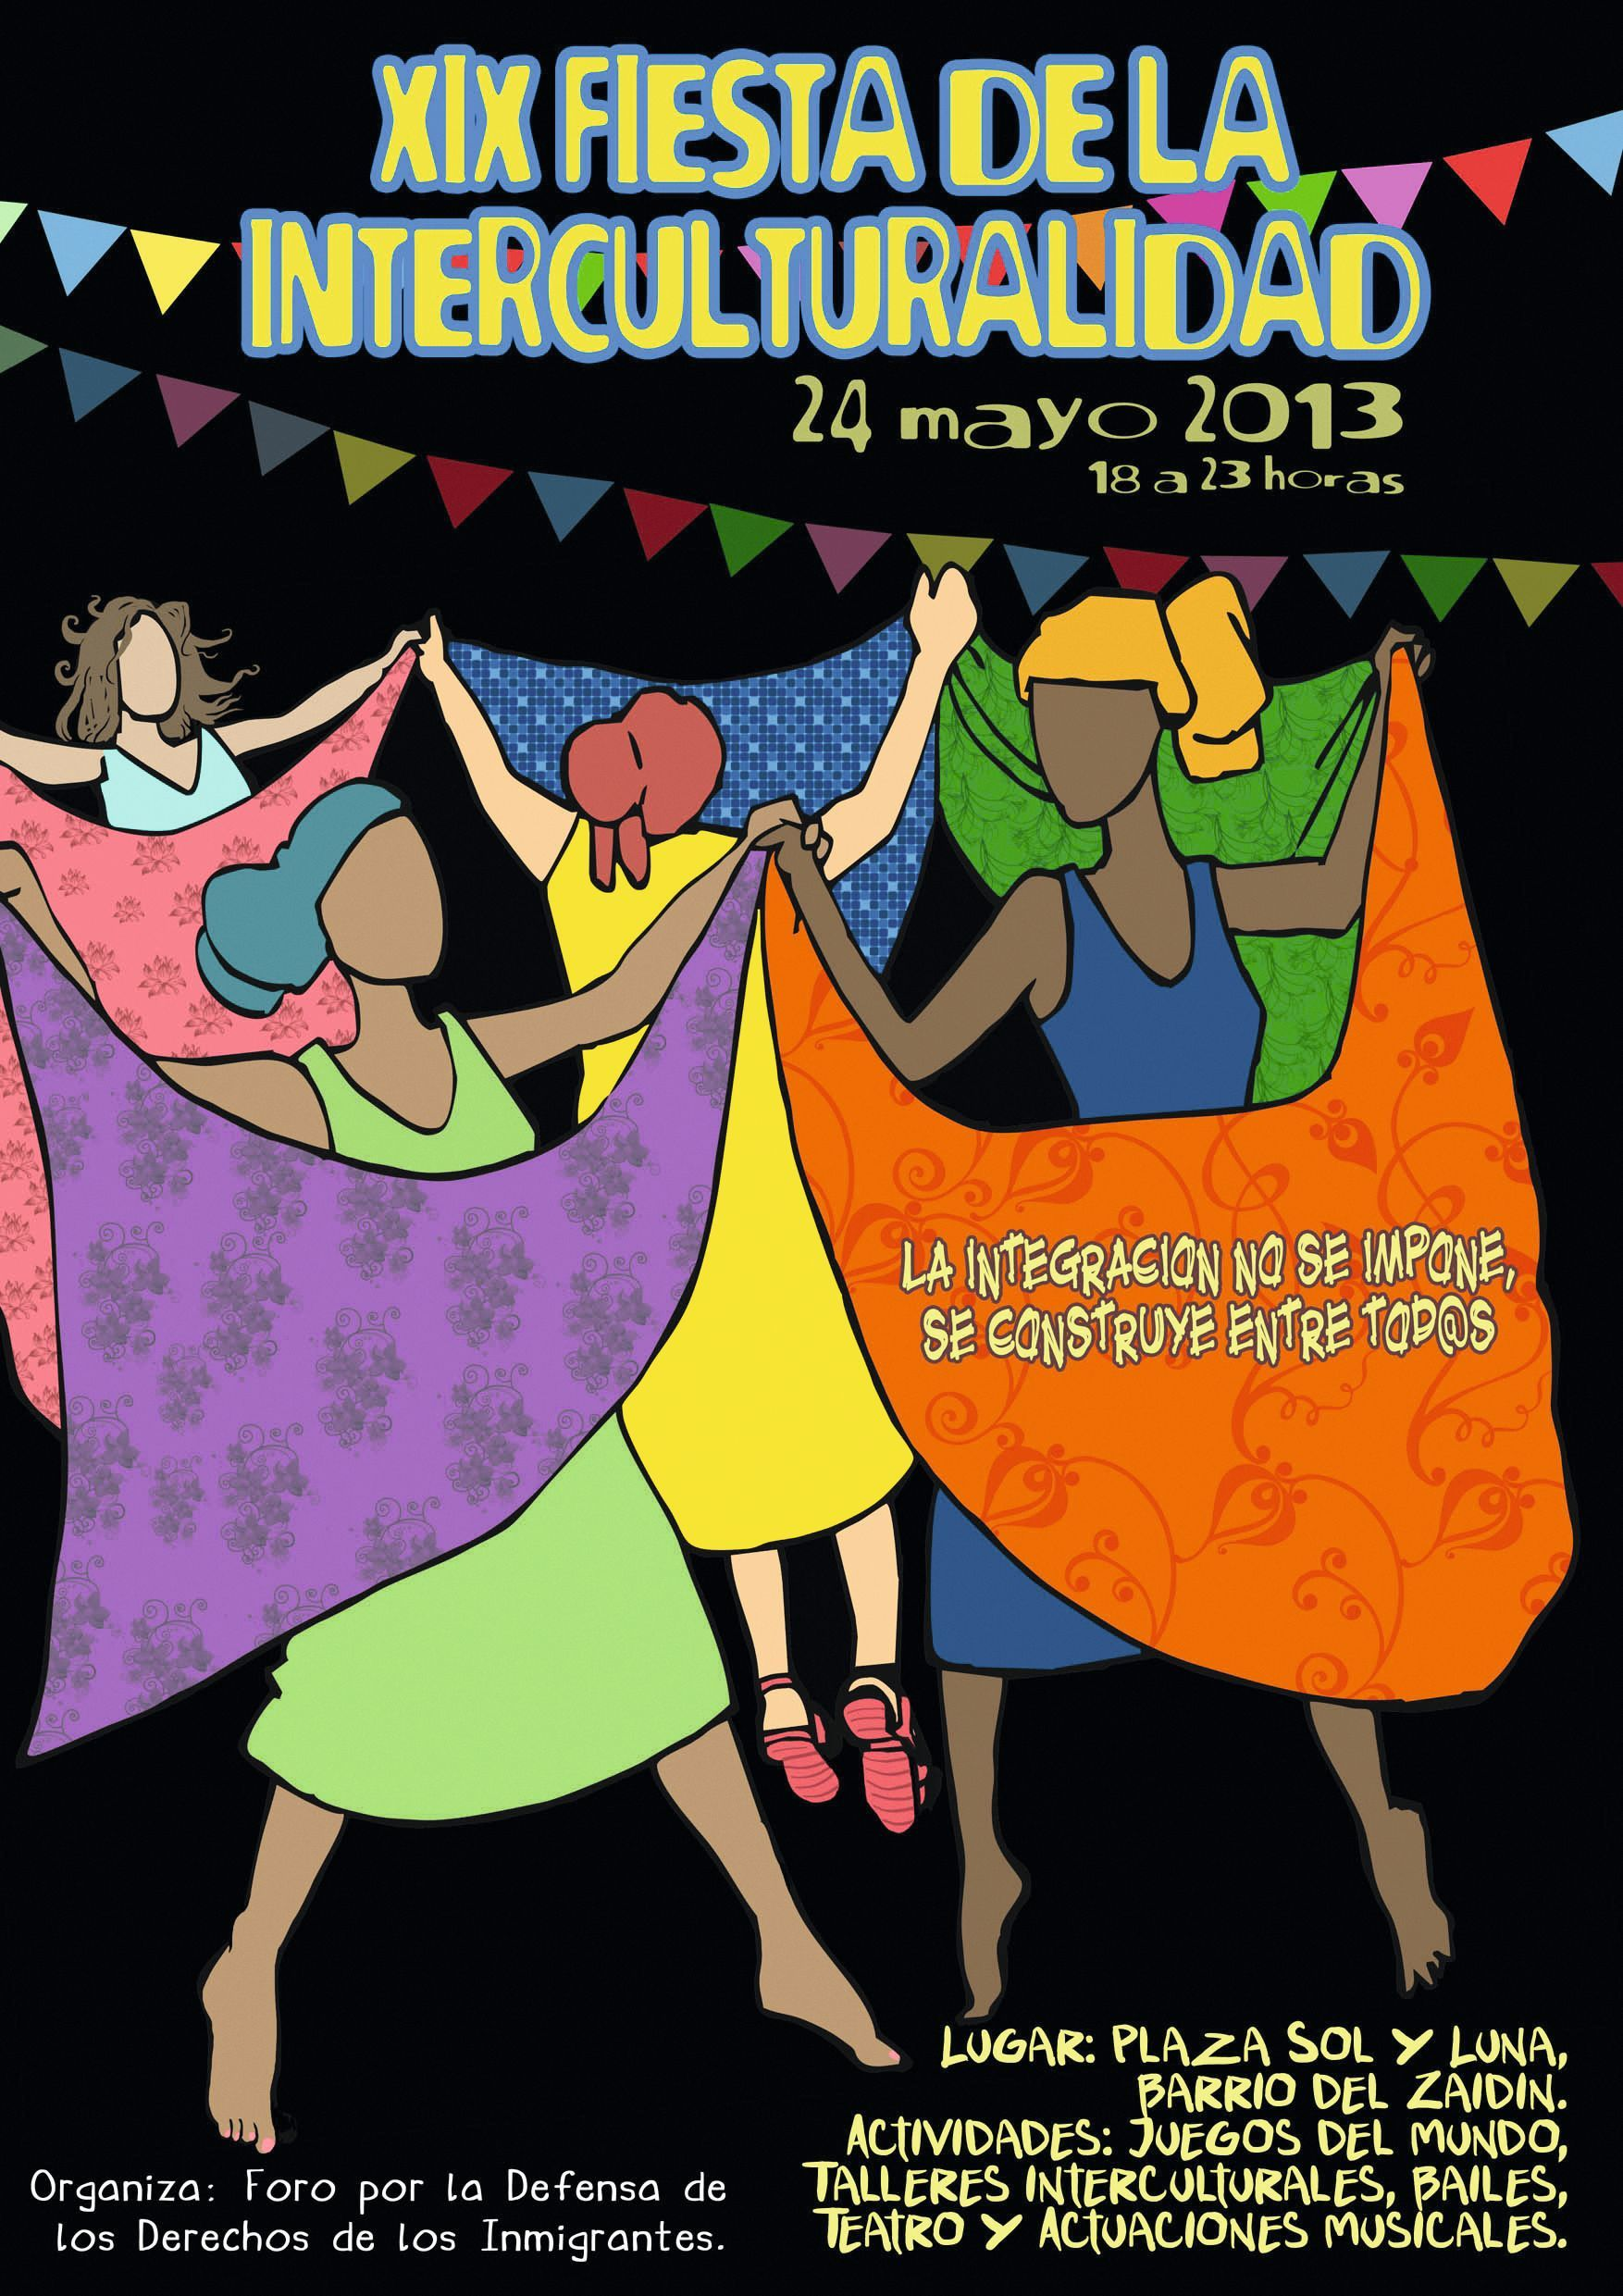 Cartel de la XIX Fiesta de la Interculturalidad en Granada, 2016.